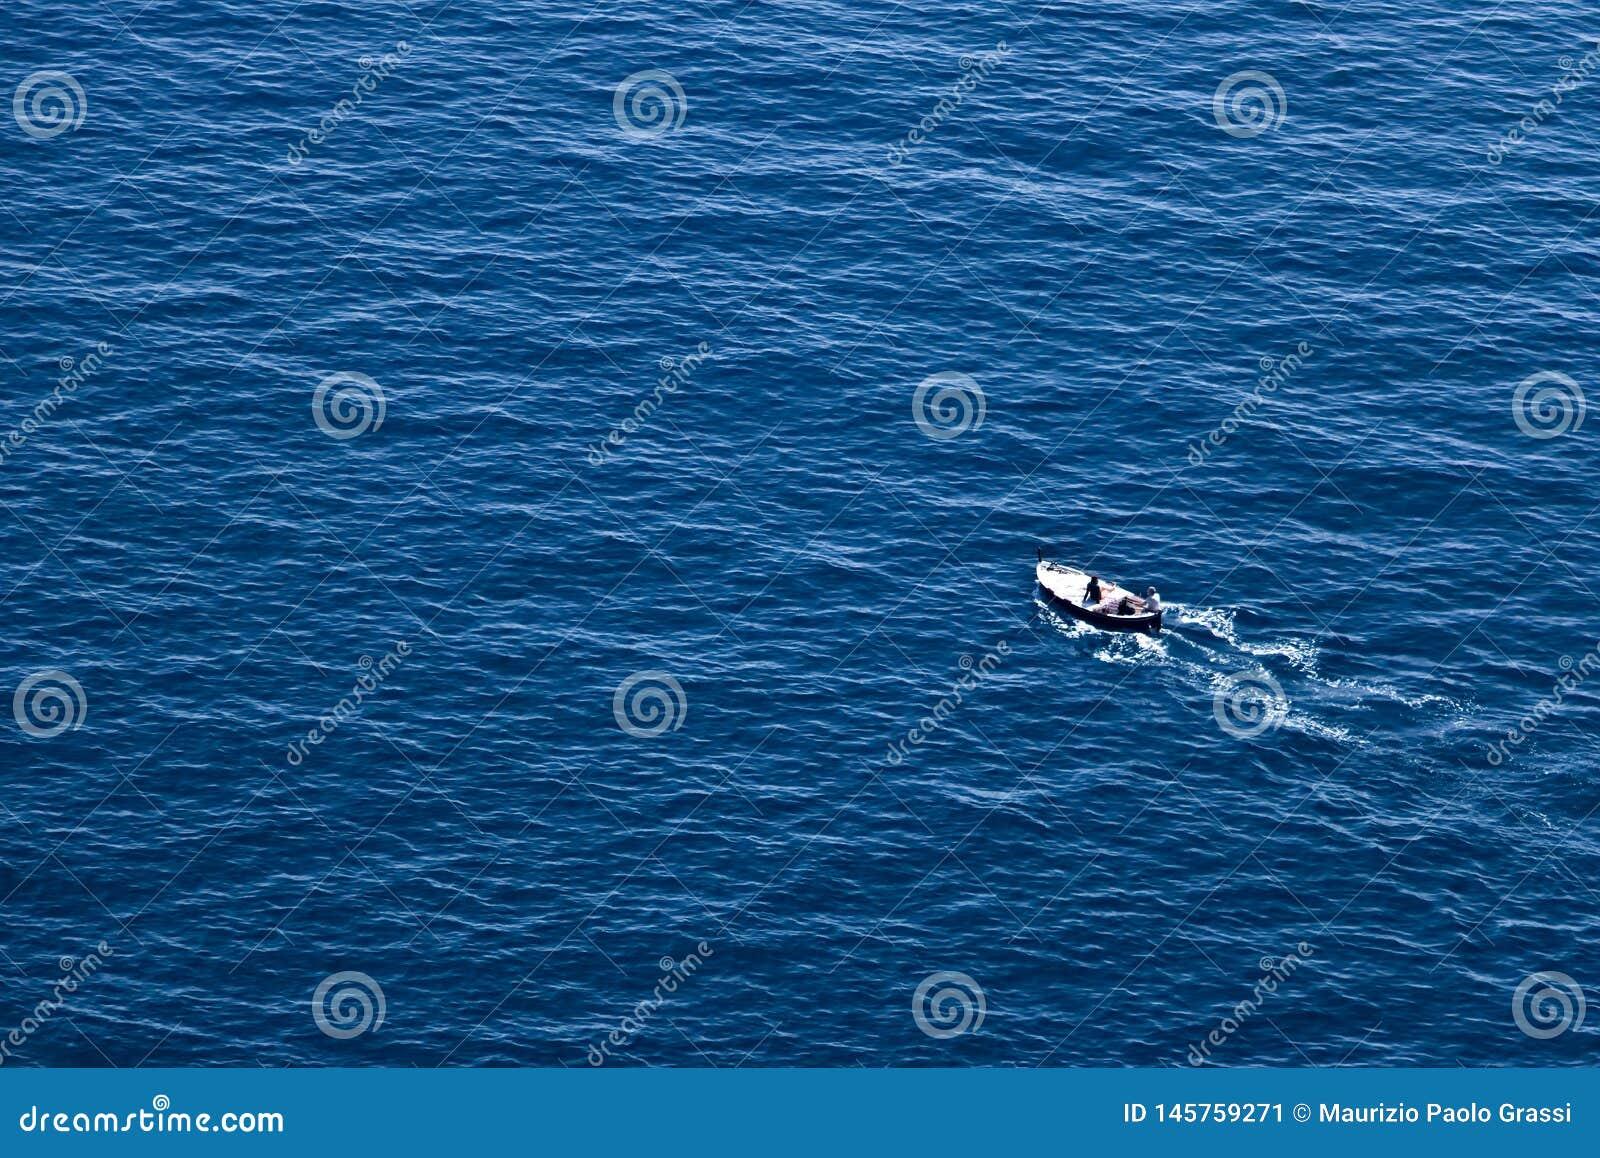 Bonassola, blisko Cinque Terre, Liguria 03/31/2019 ??d? rybacka w b??kitnym morzu blisko Pi?? ziemi